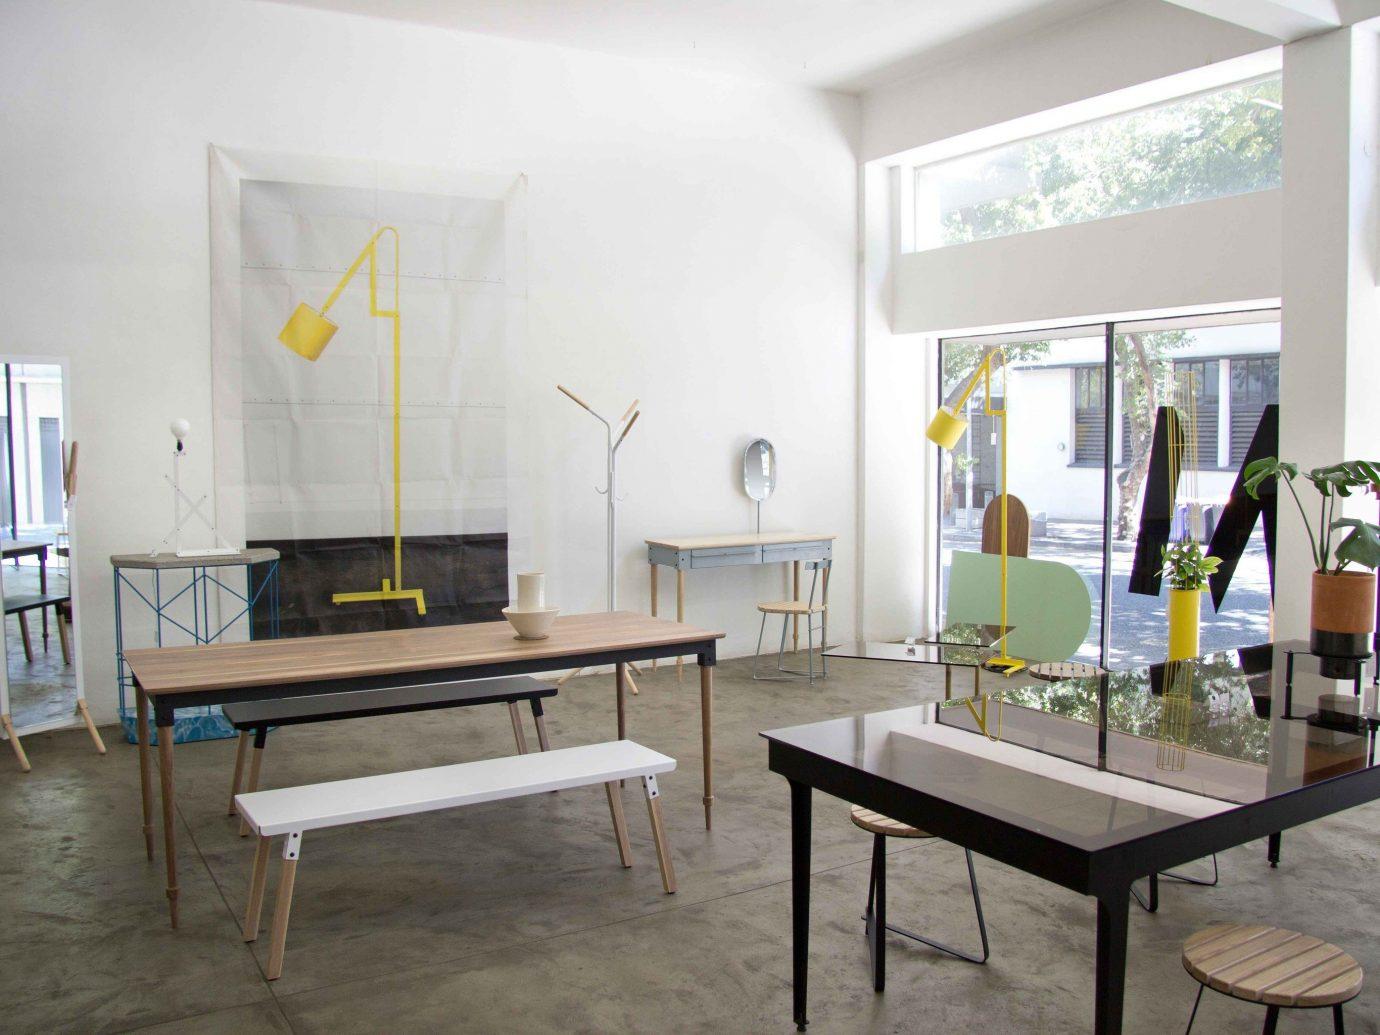 Trip Ideas floor indoor wall room property window dining room interior design estate real estate Design home table area furniture several